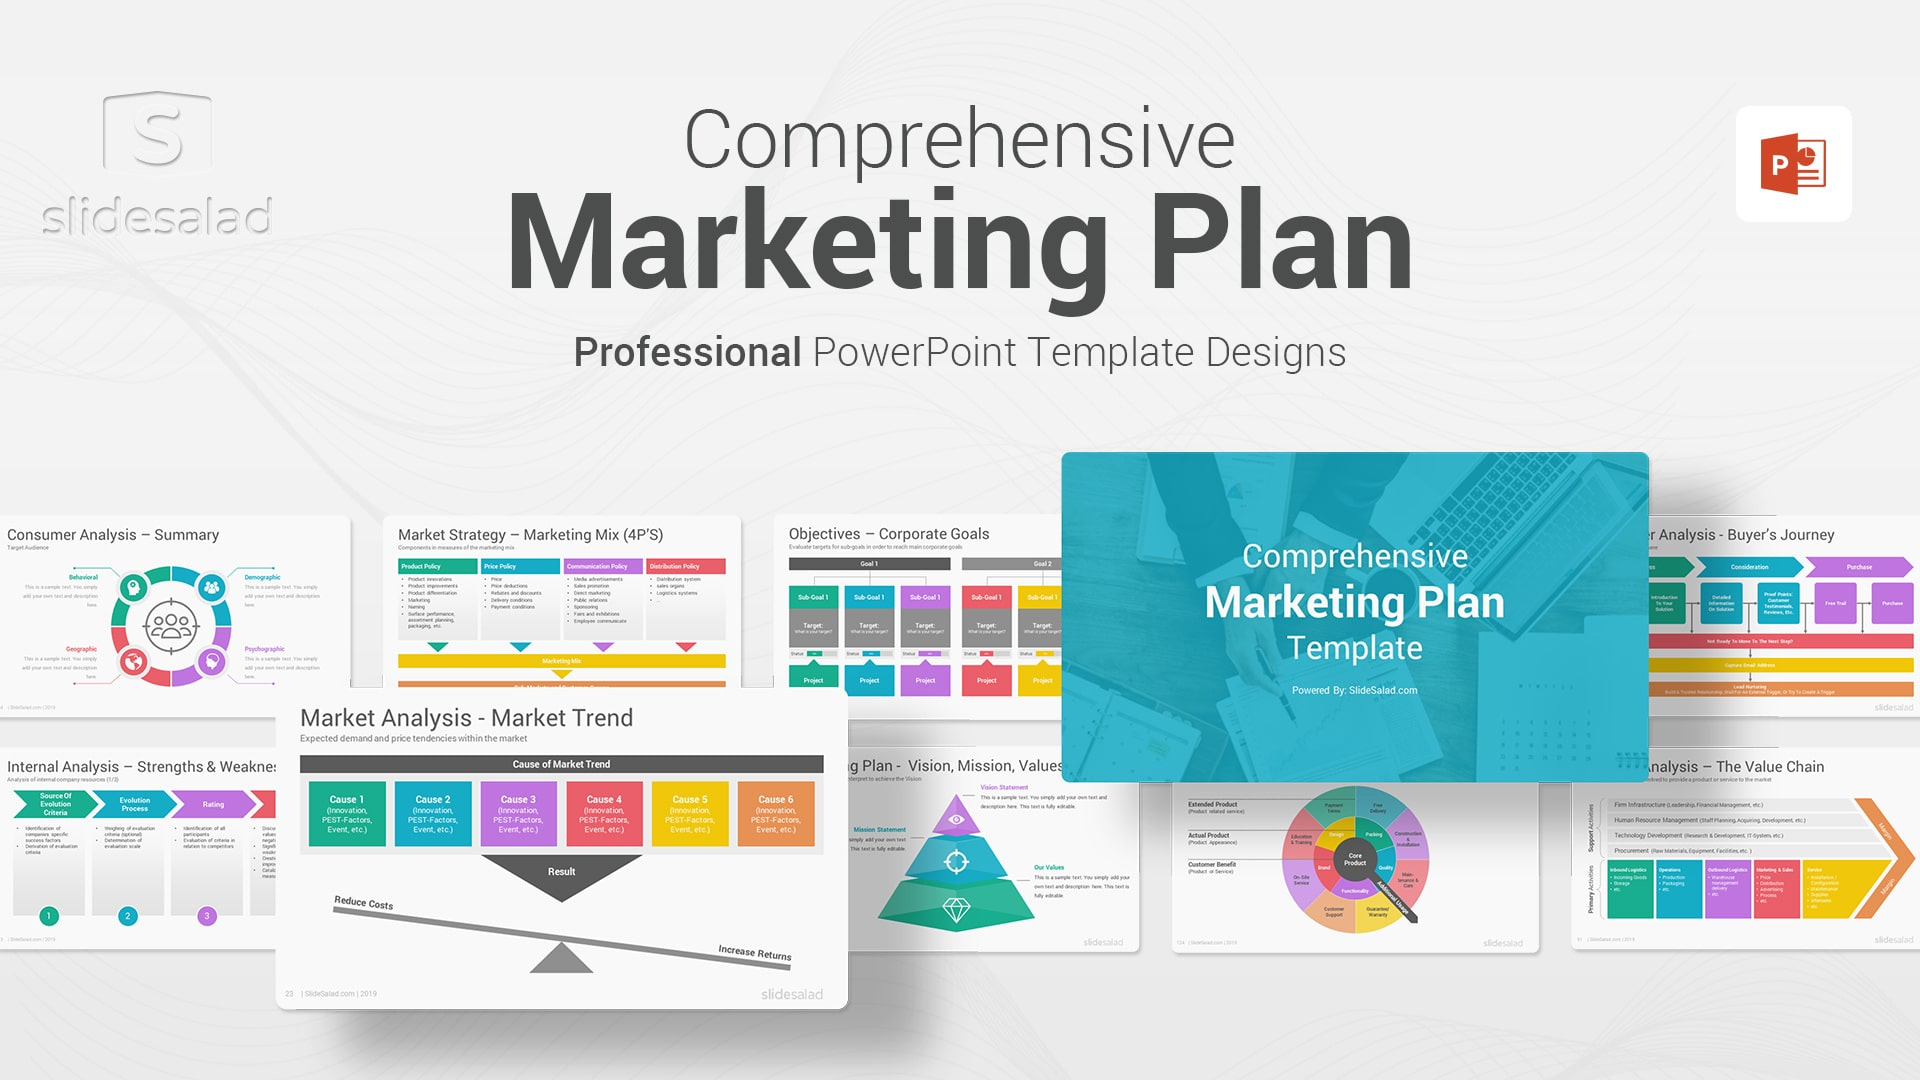 Best Marketing Plan PowerPoint (PPT) Template - Customizable PowerPoint Slide Design Template